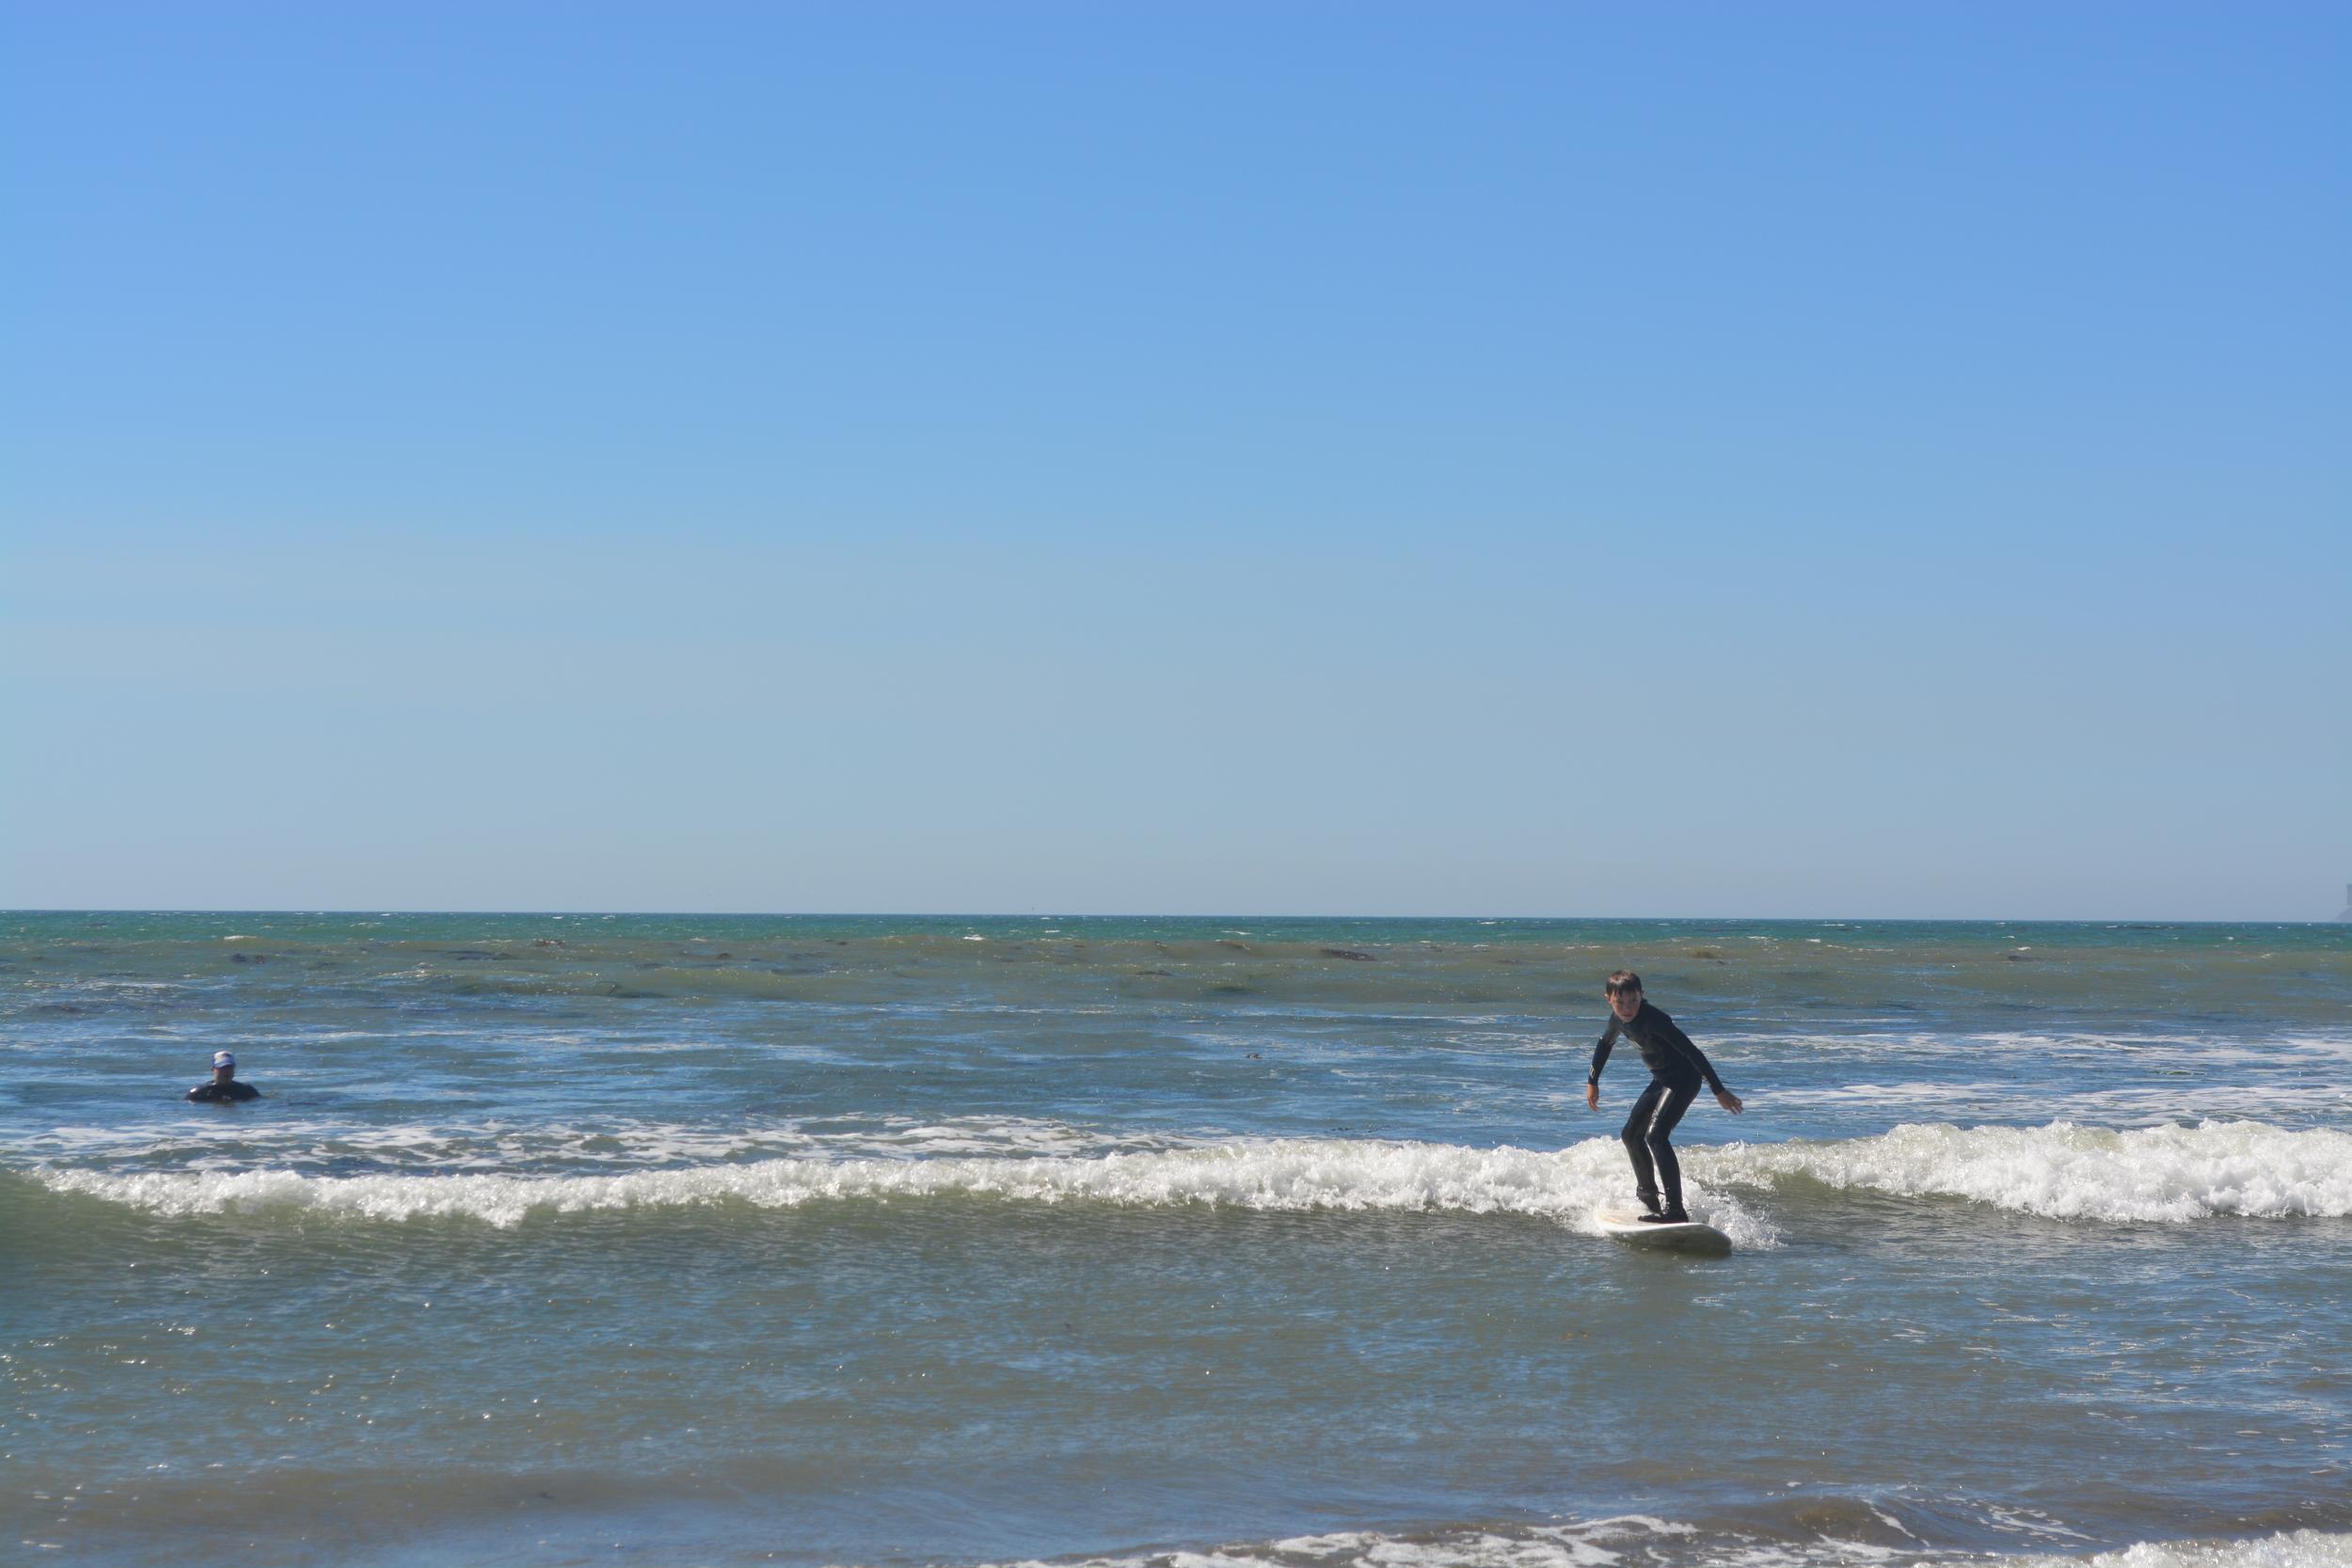 Baja California 10-5-13 Shipwrecks Surfing Adventure Ocean Experience Surf School San Diego (14).JPG